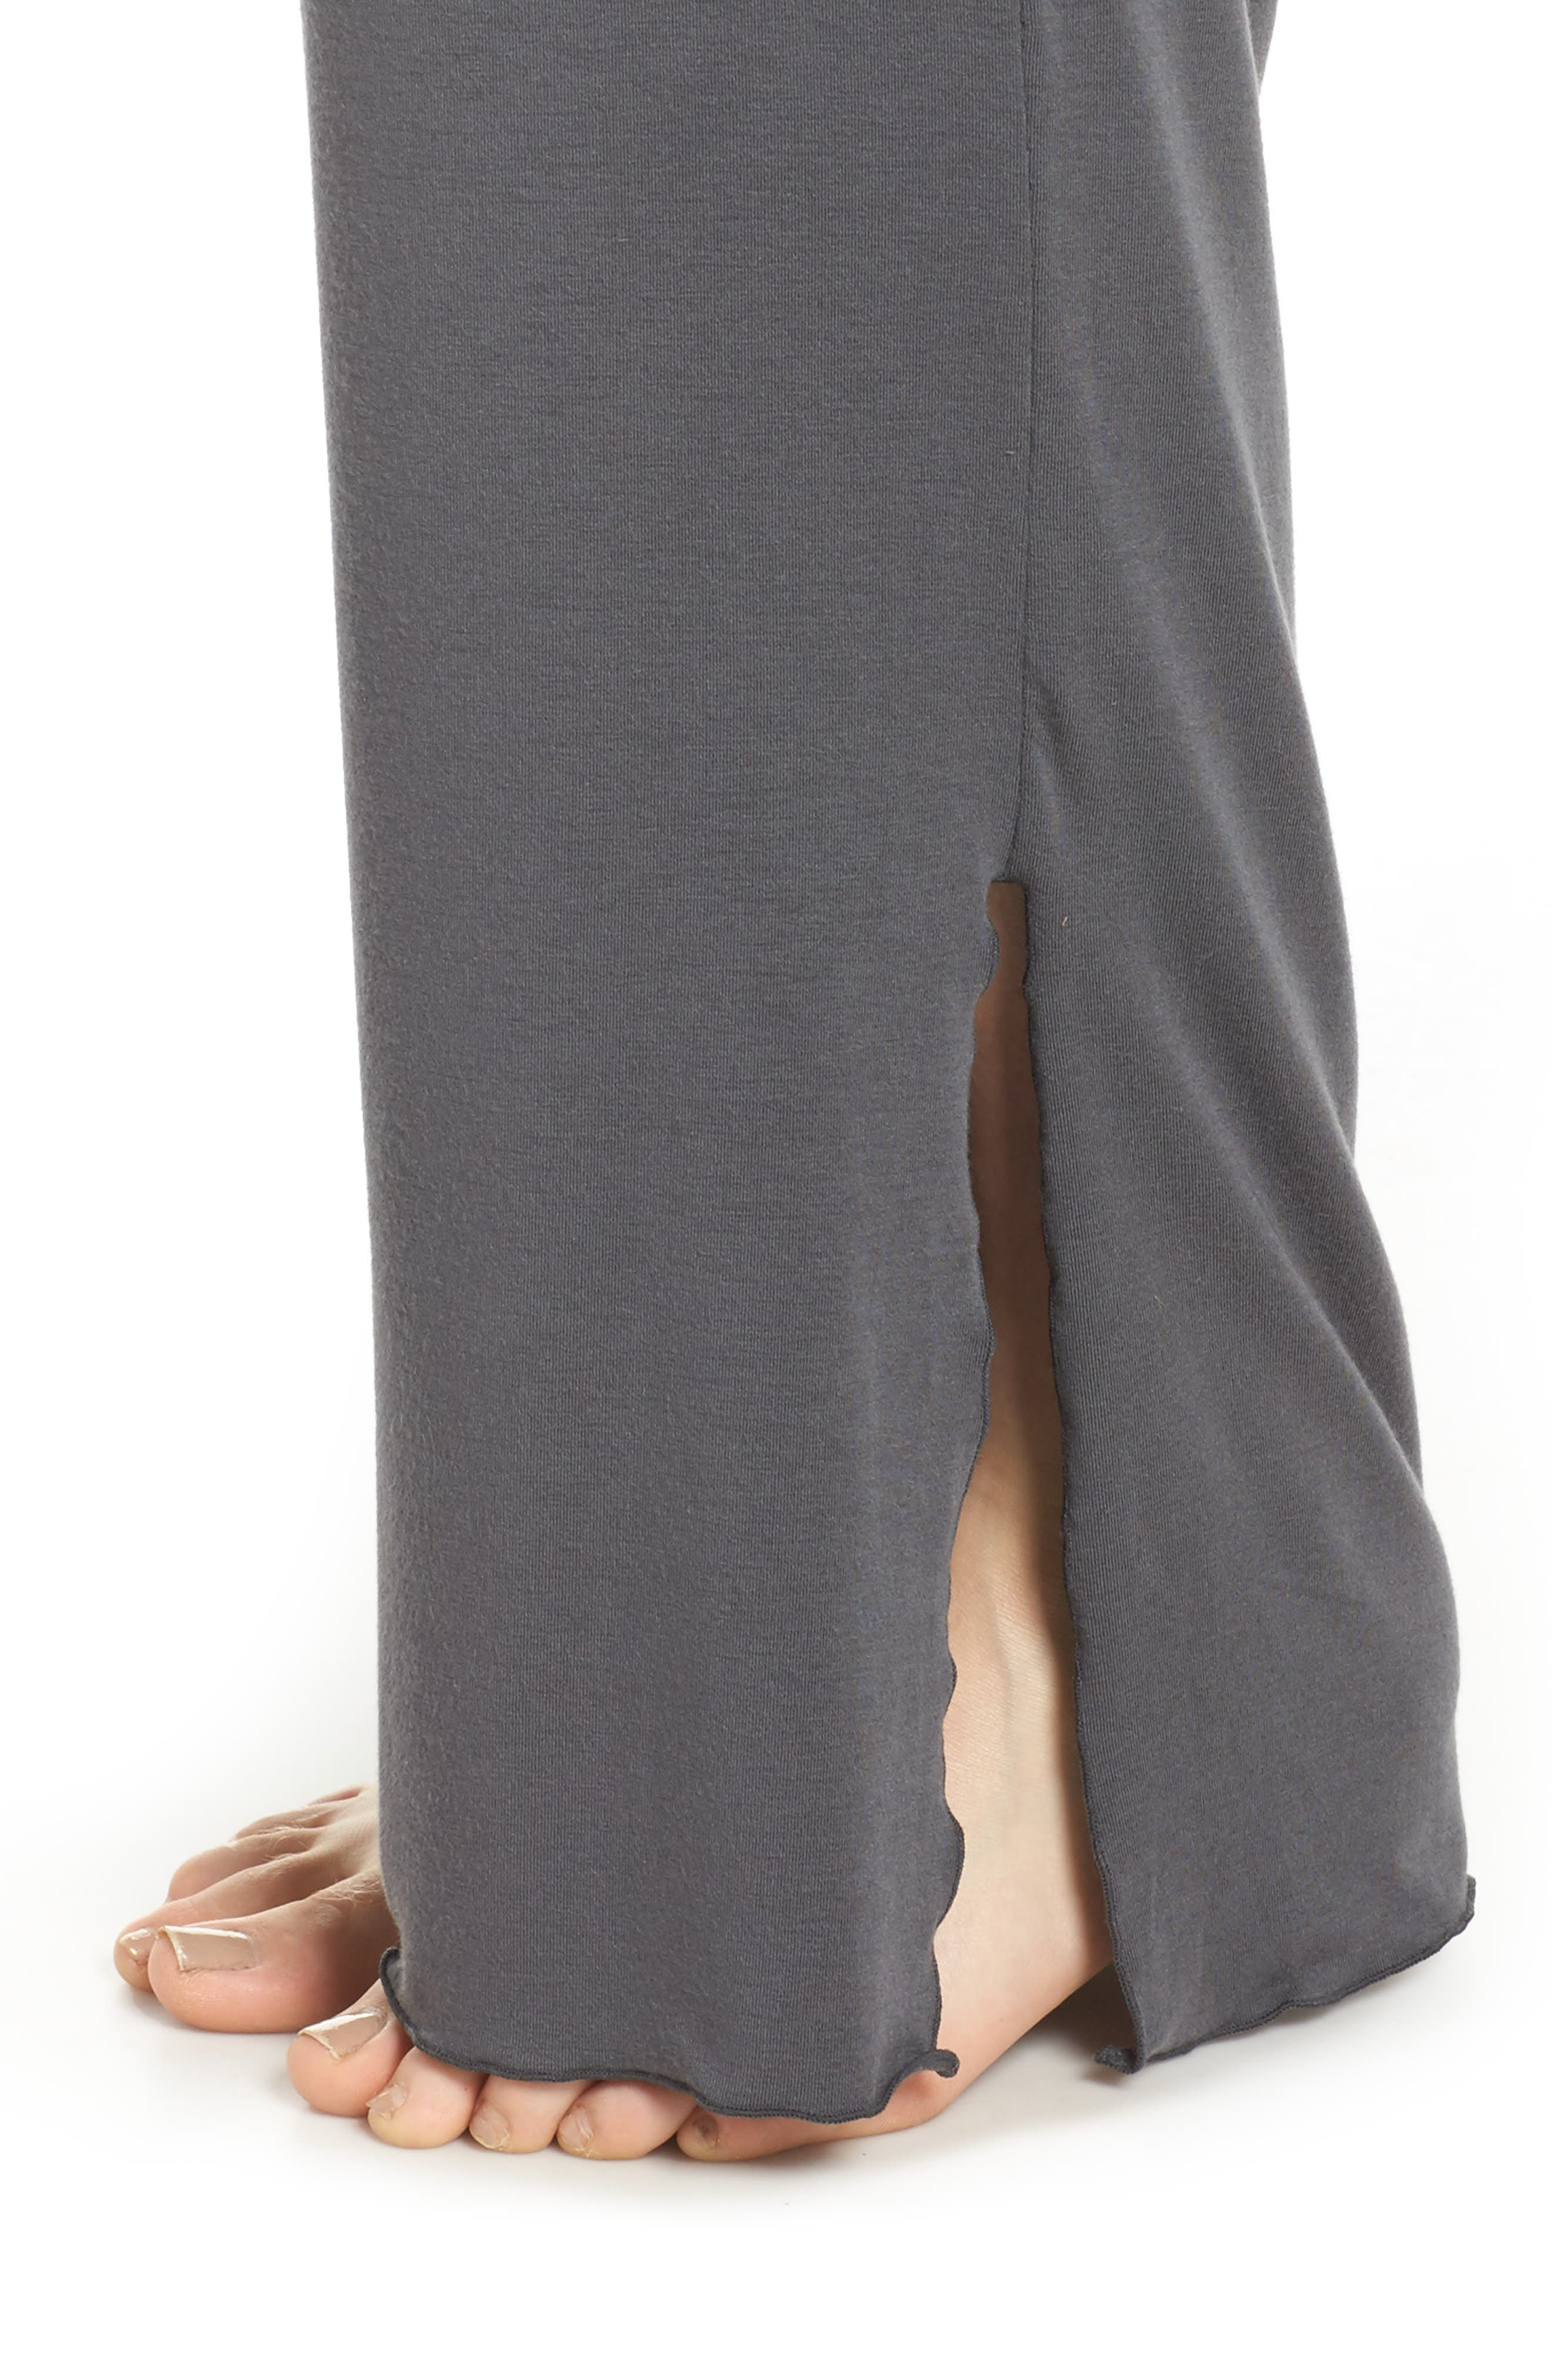 Lace Trim Pants,                             Alternate thumbnail 4, color,                             SLATE WITH JAVA LACE